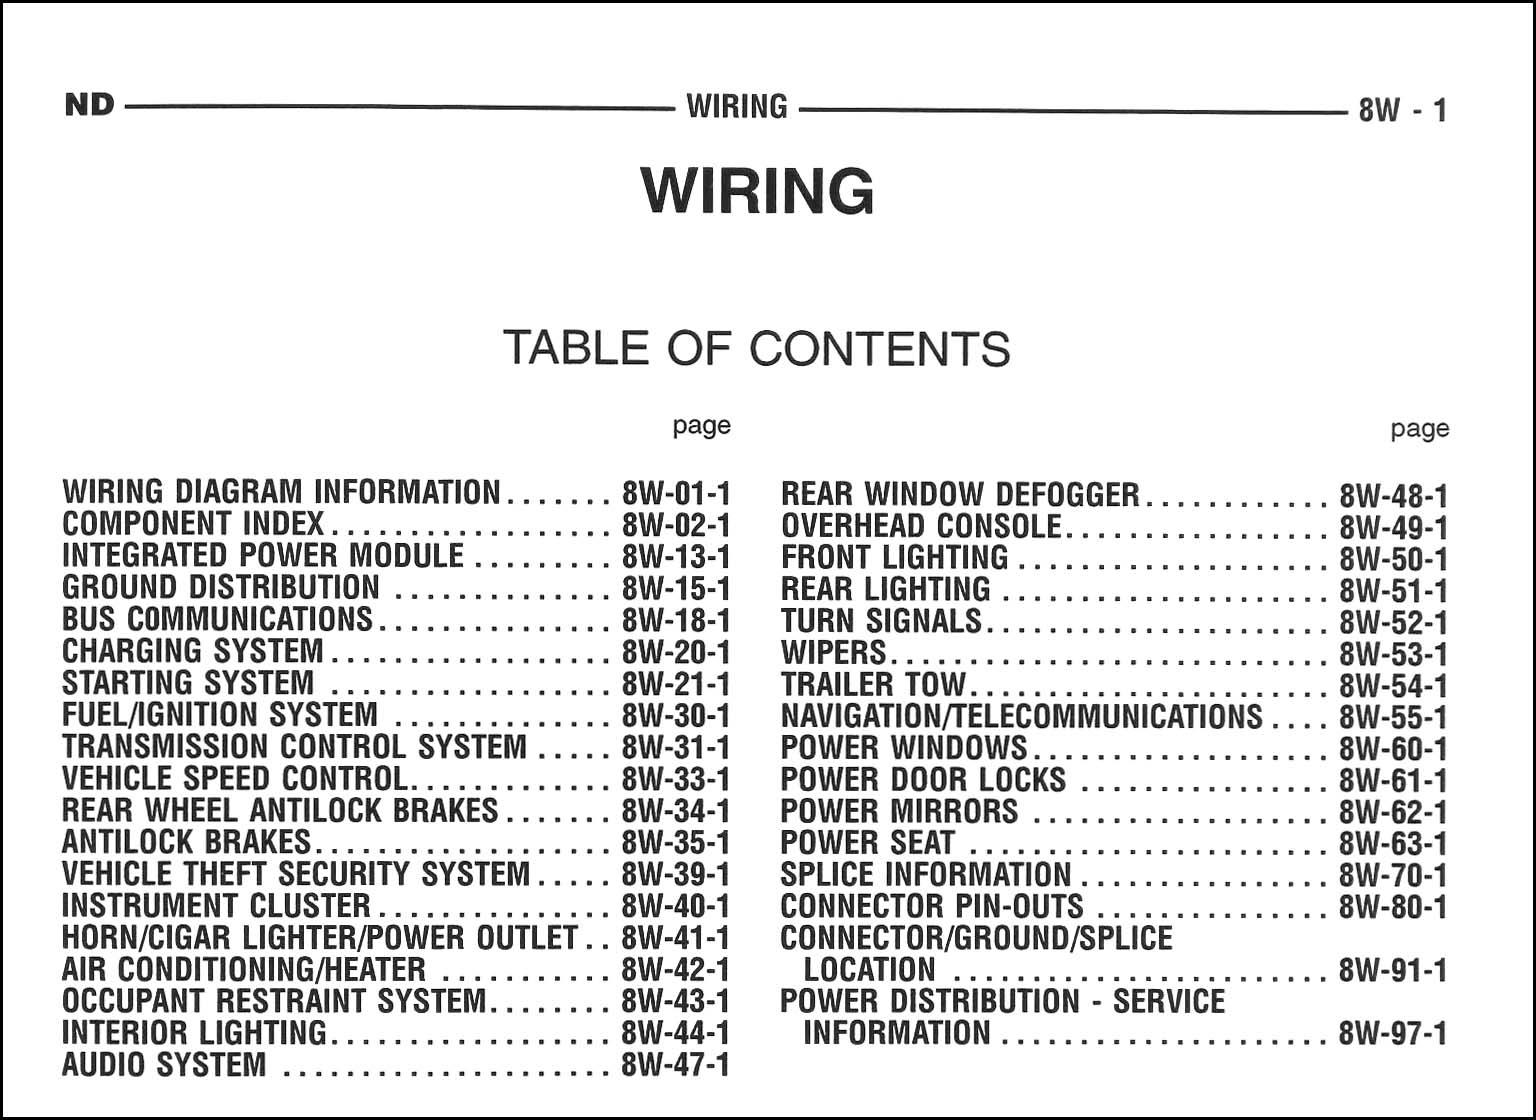 2005DodgeDakotaOWD TOC?resize=665%2C485 wiring diagram 1992 dodge dakota the wiring diagram readingrat net 2005 dodge dakota wiring diagram at honlapkeszites.co